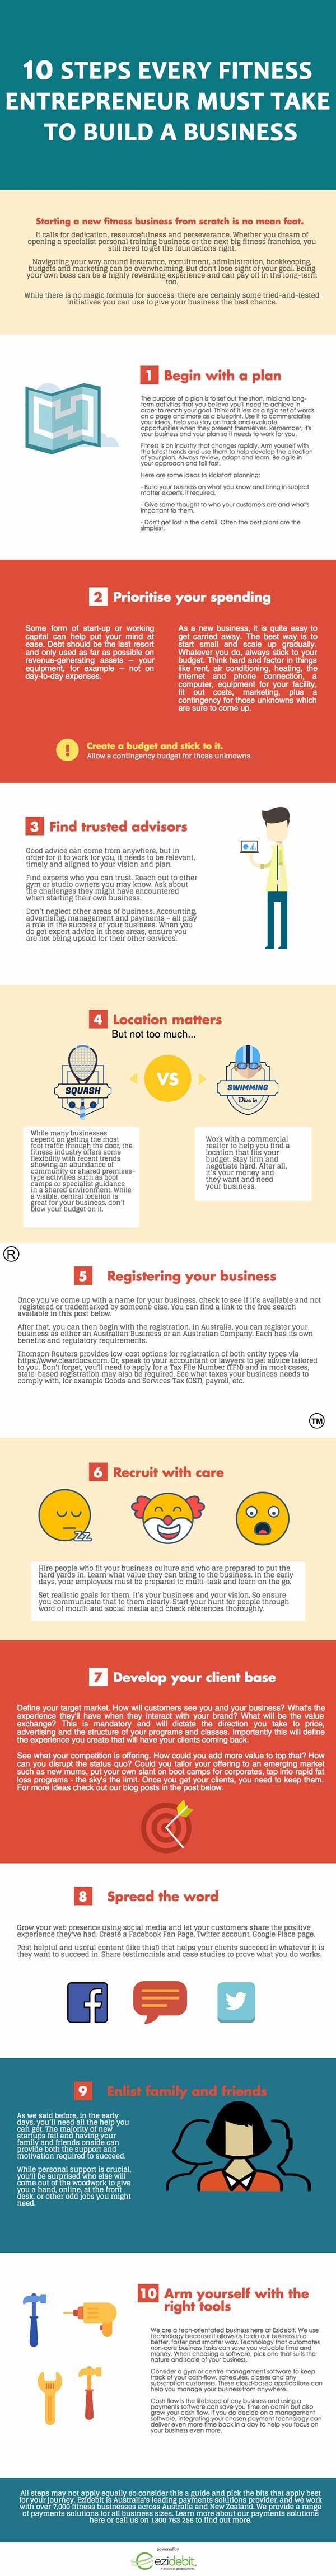 Steps for fitness entrepreneurs to start a business